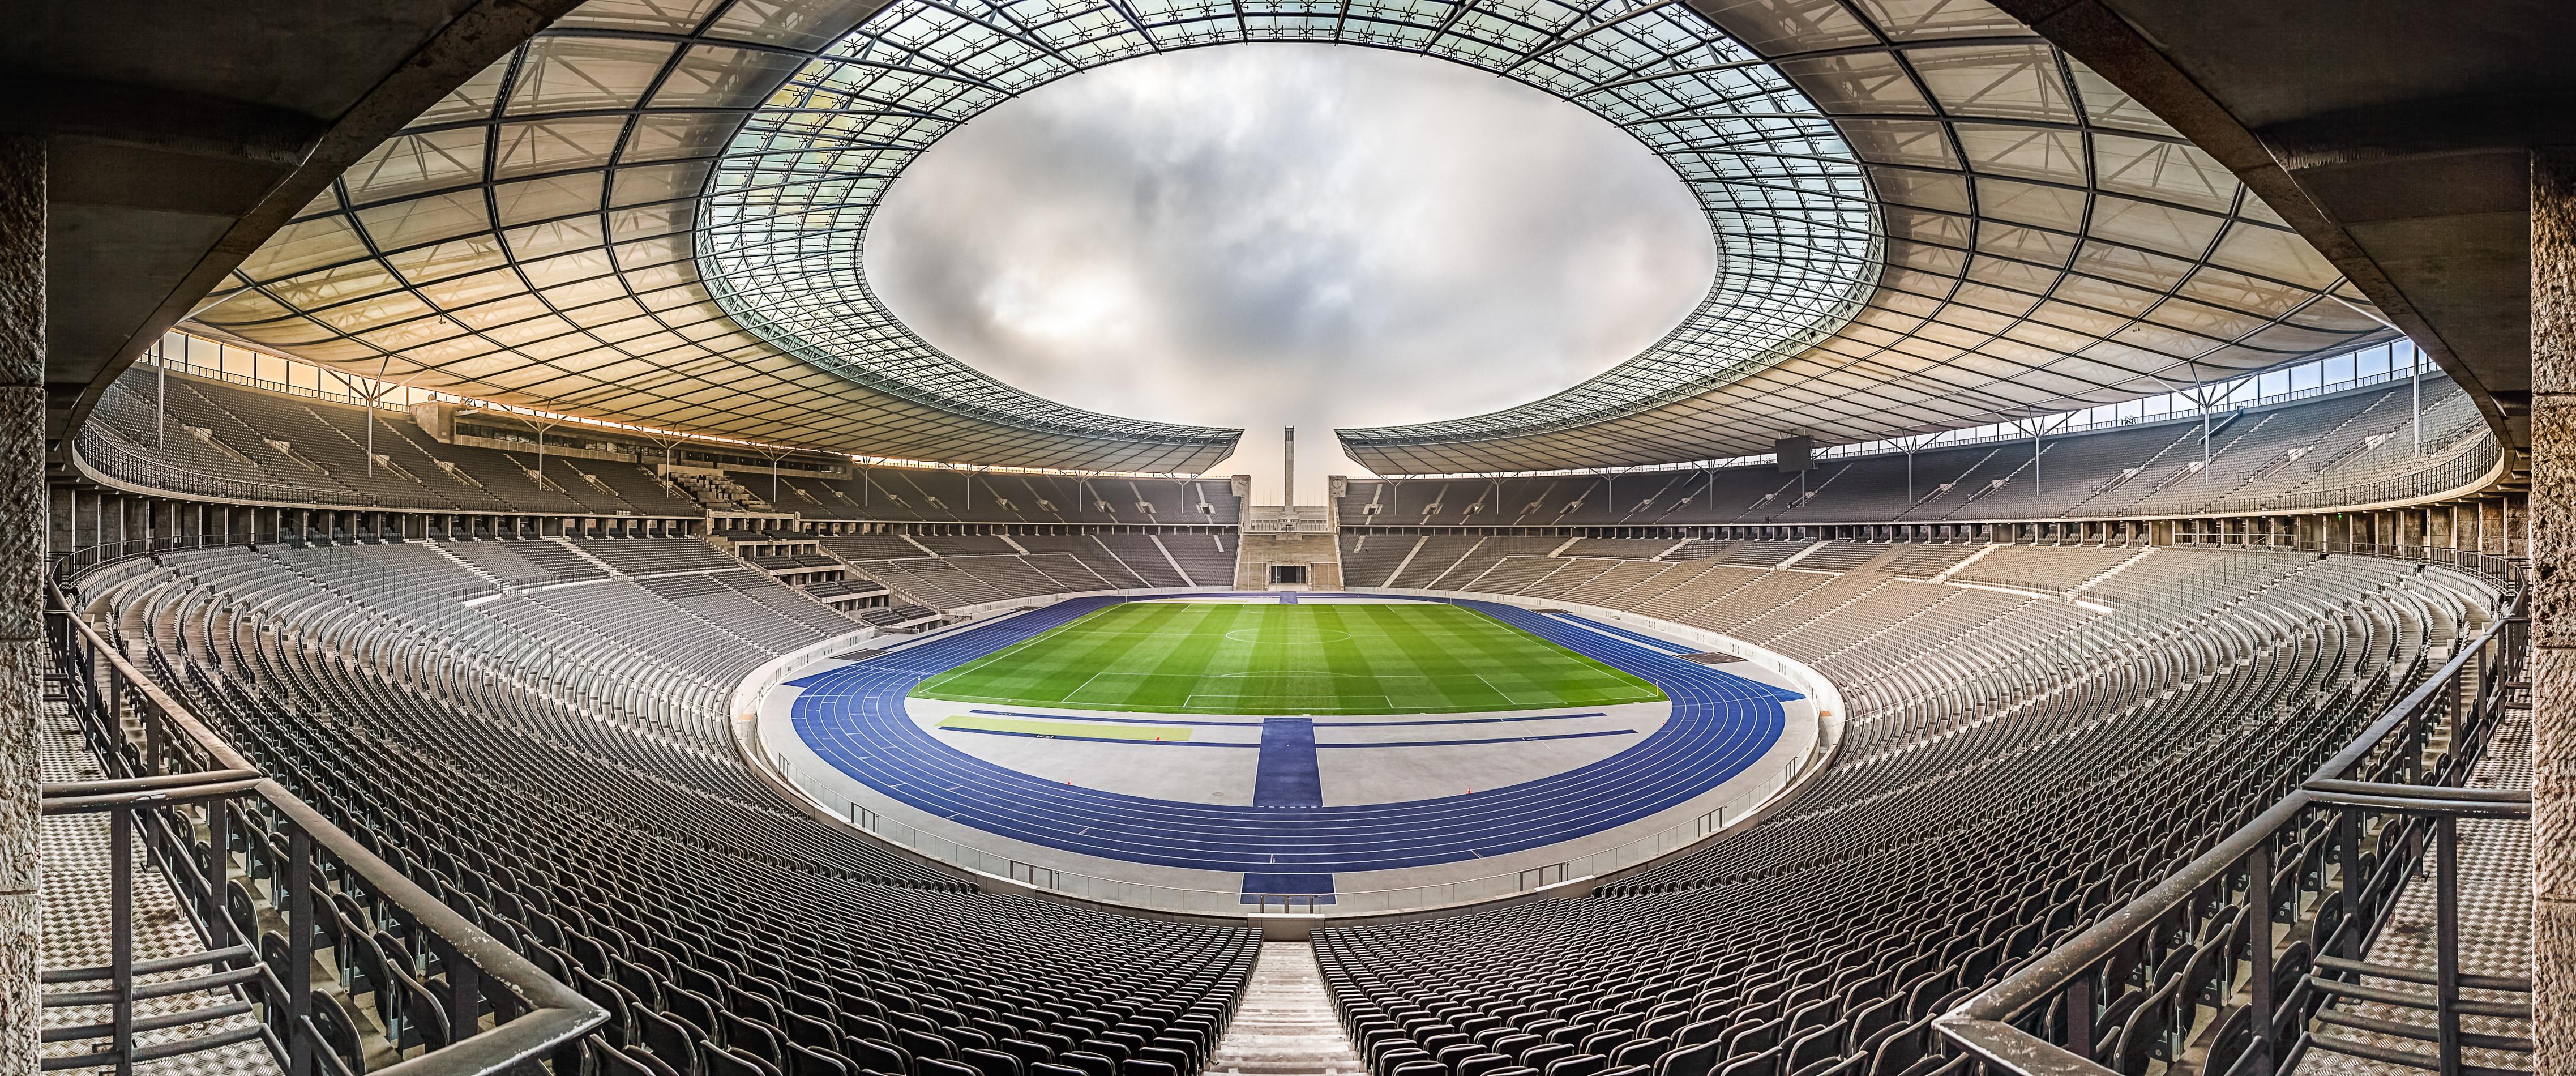 """ Olympiastadion Berlin Panorama "" Photo taken by Fotograf Patrick Gawandtka"